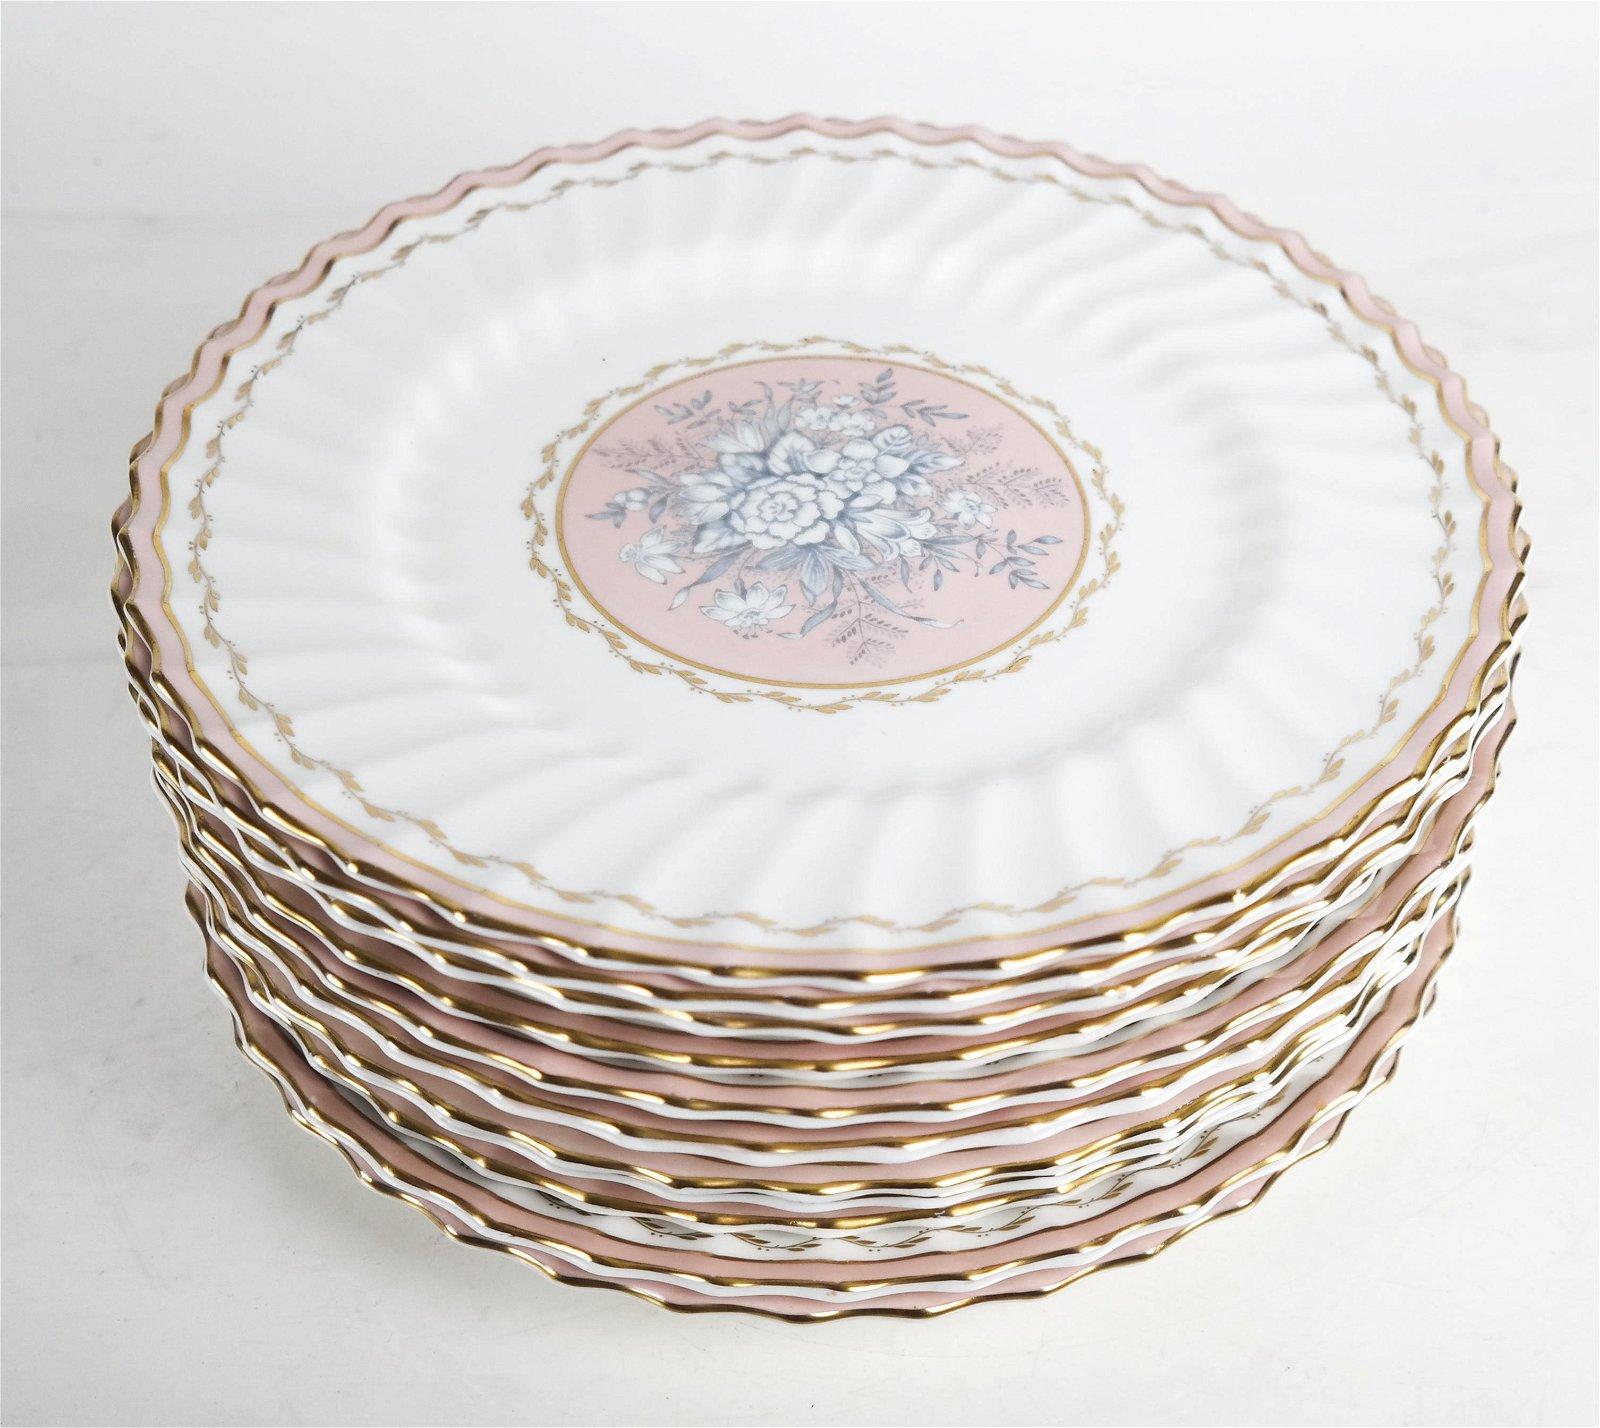 12 Royal Doulton, England Porcelain Plates